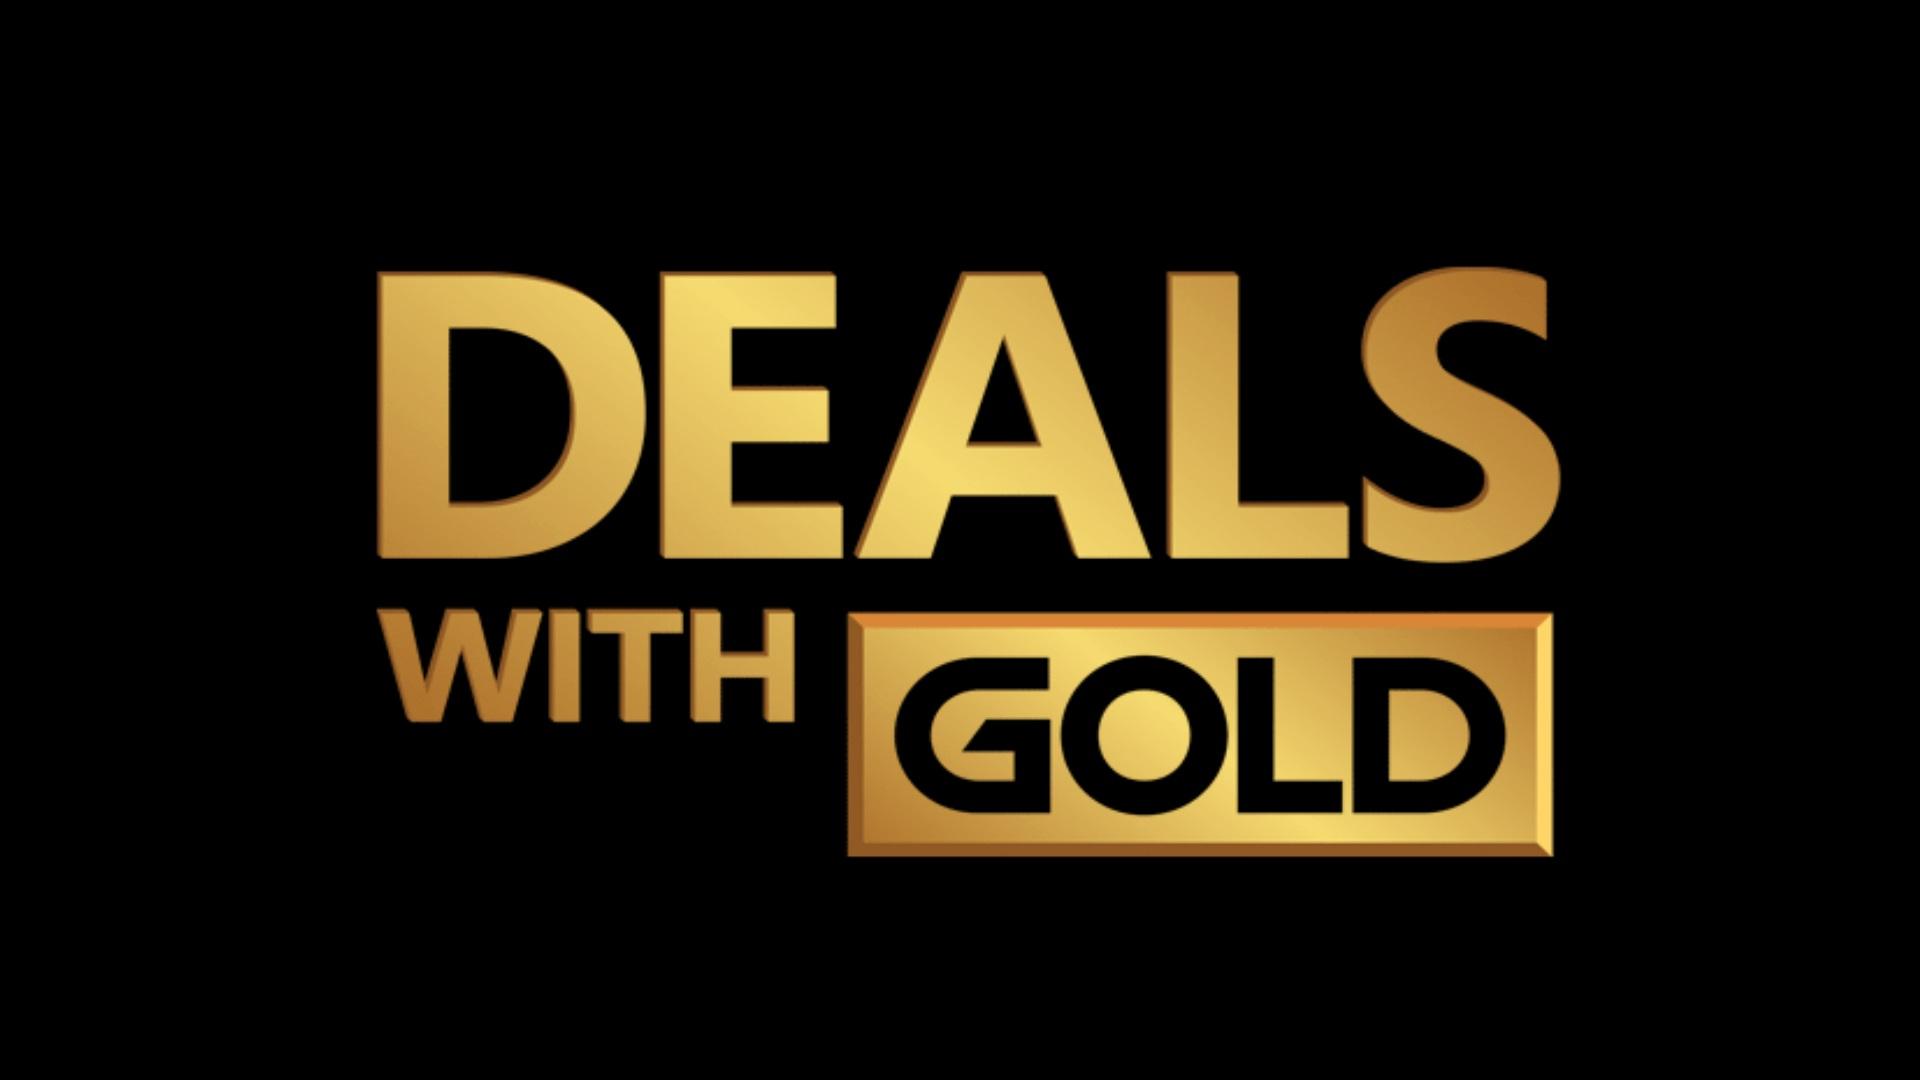 Deals With Gold: Economize baixando estes jogos